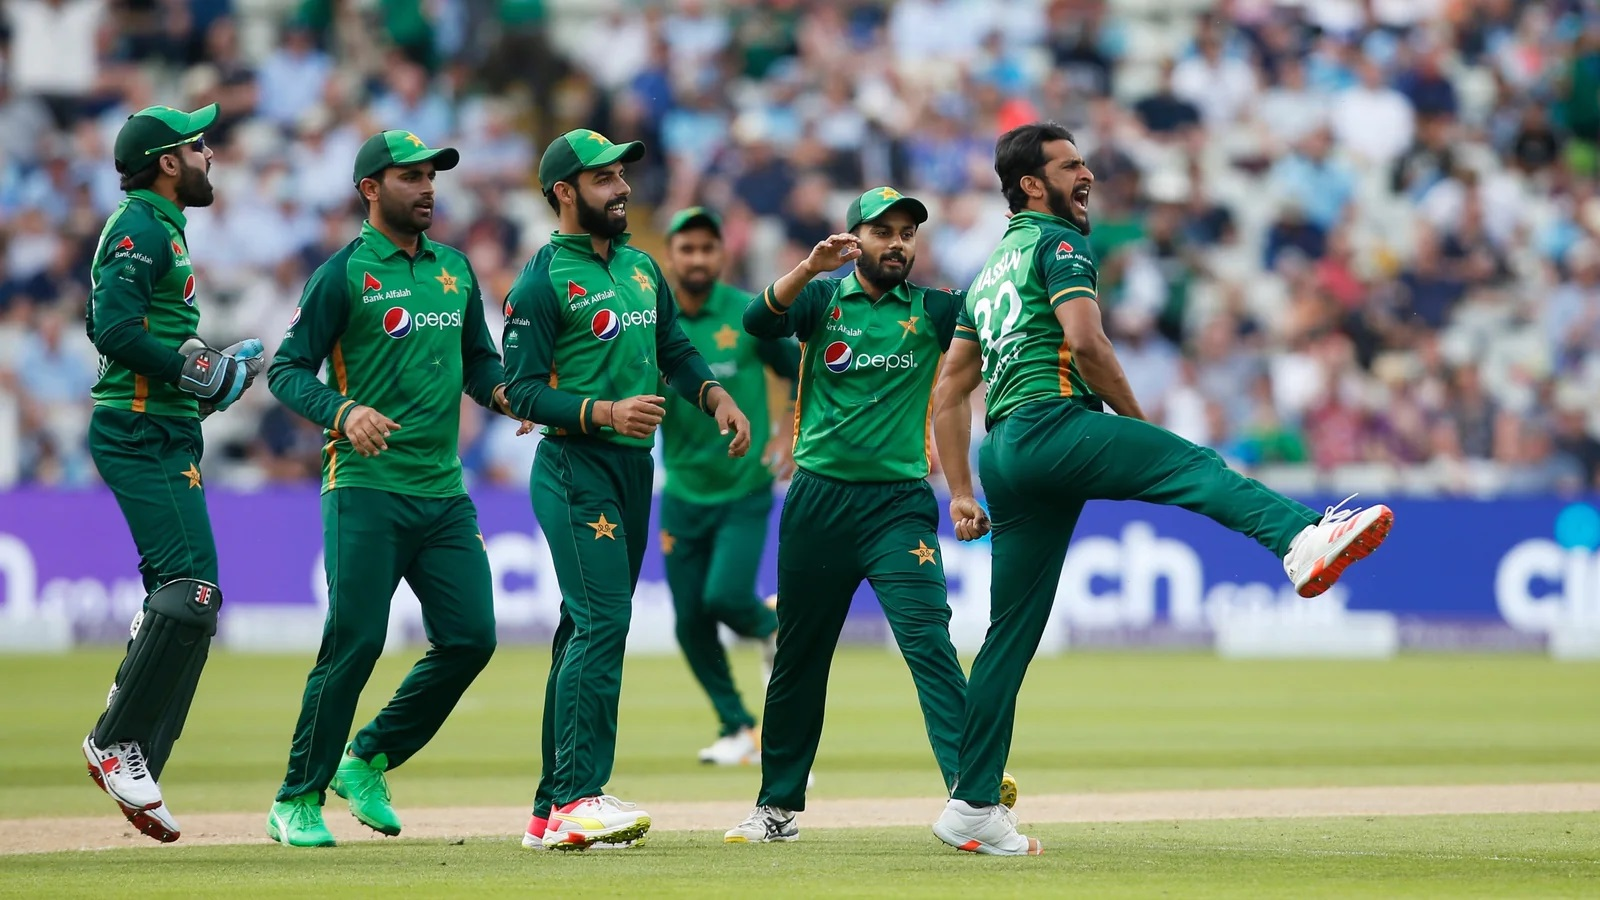 India vs Pakistan, Gautam Gambhir, Pakistan, India